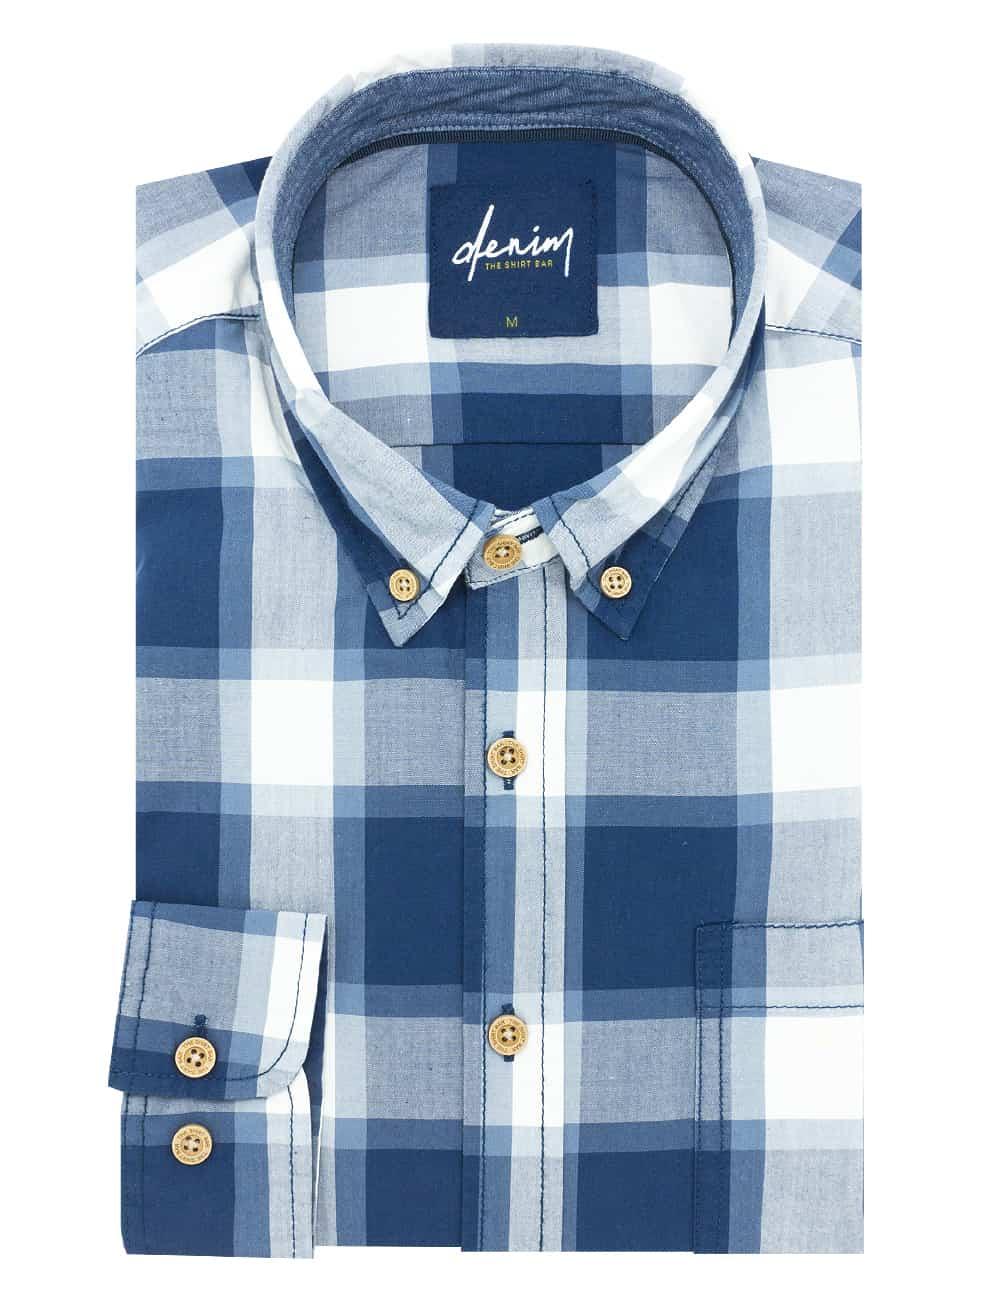 RF Navy Checks Denim Collection 100% Cotton Long Sleeve Single Cuff Shirt RF37B1.8